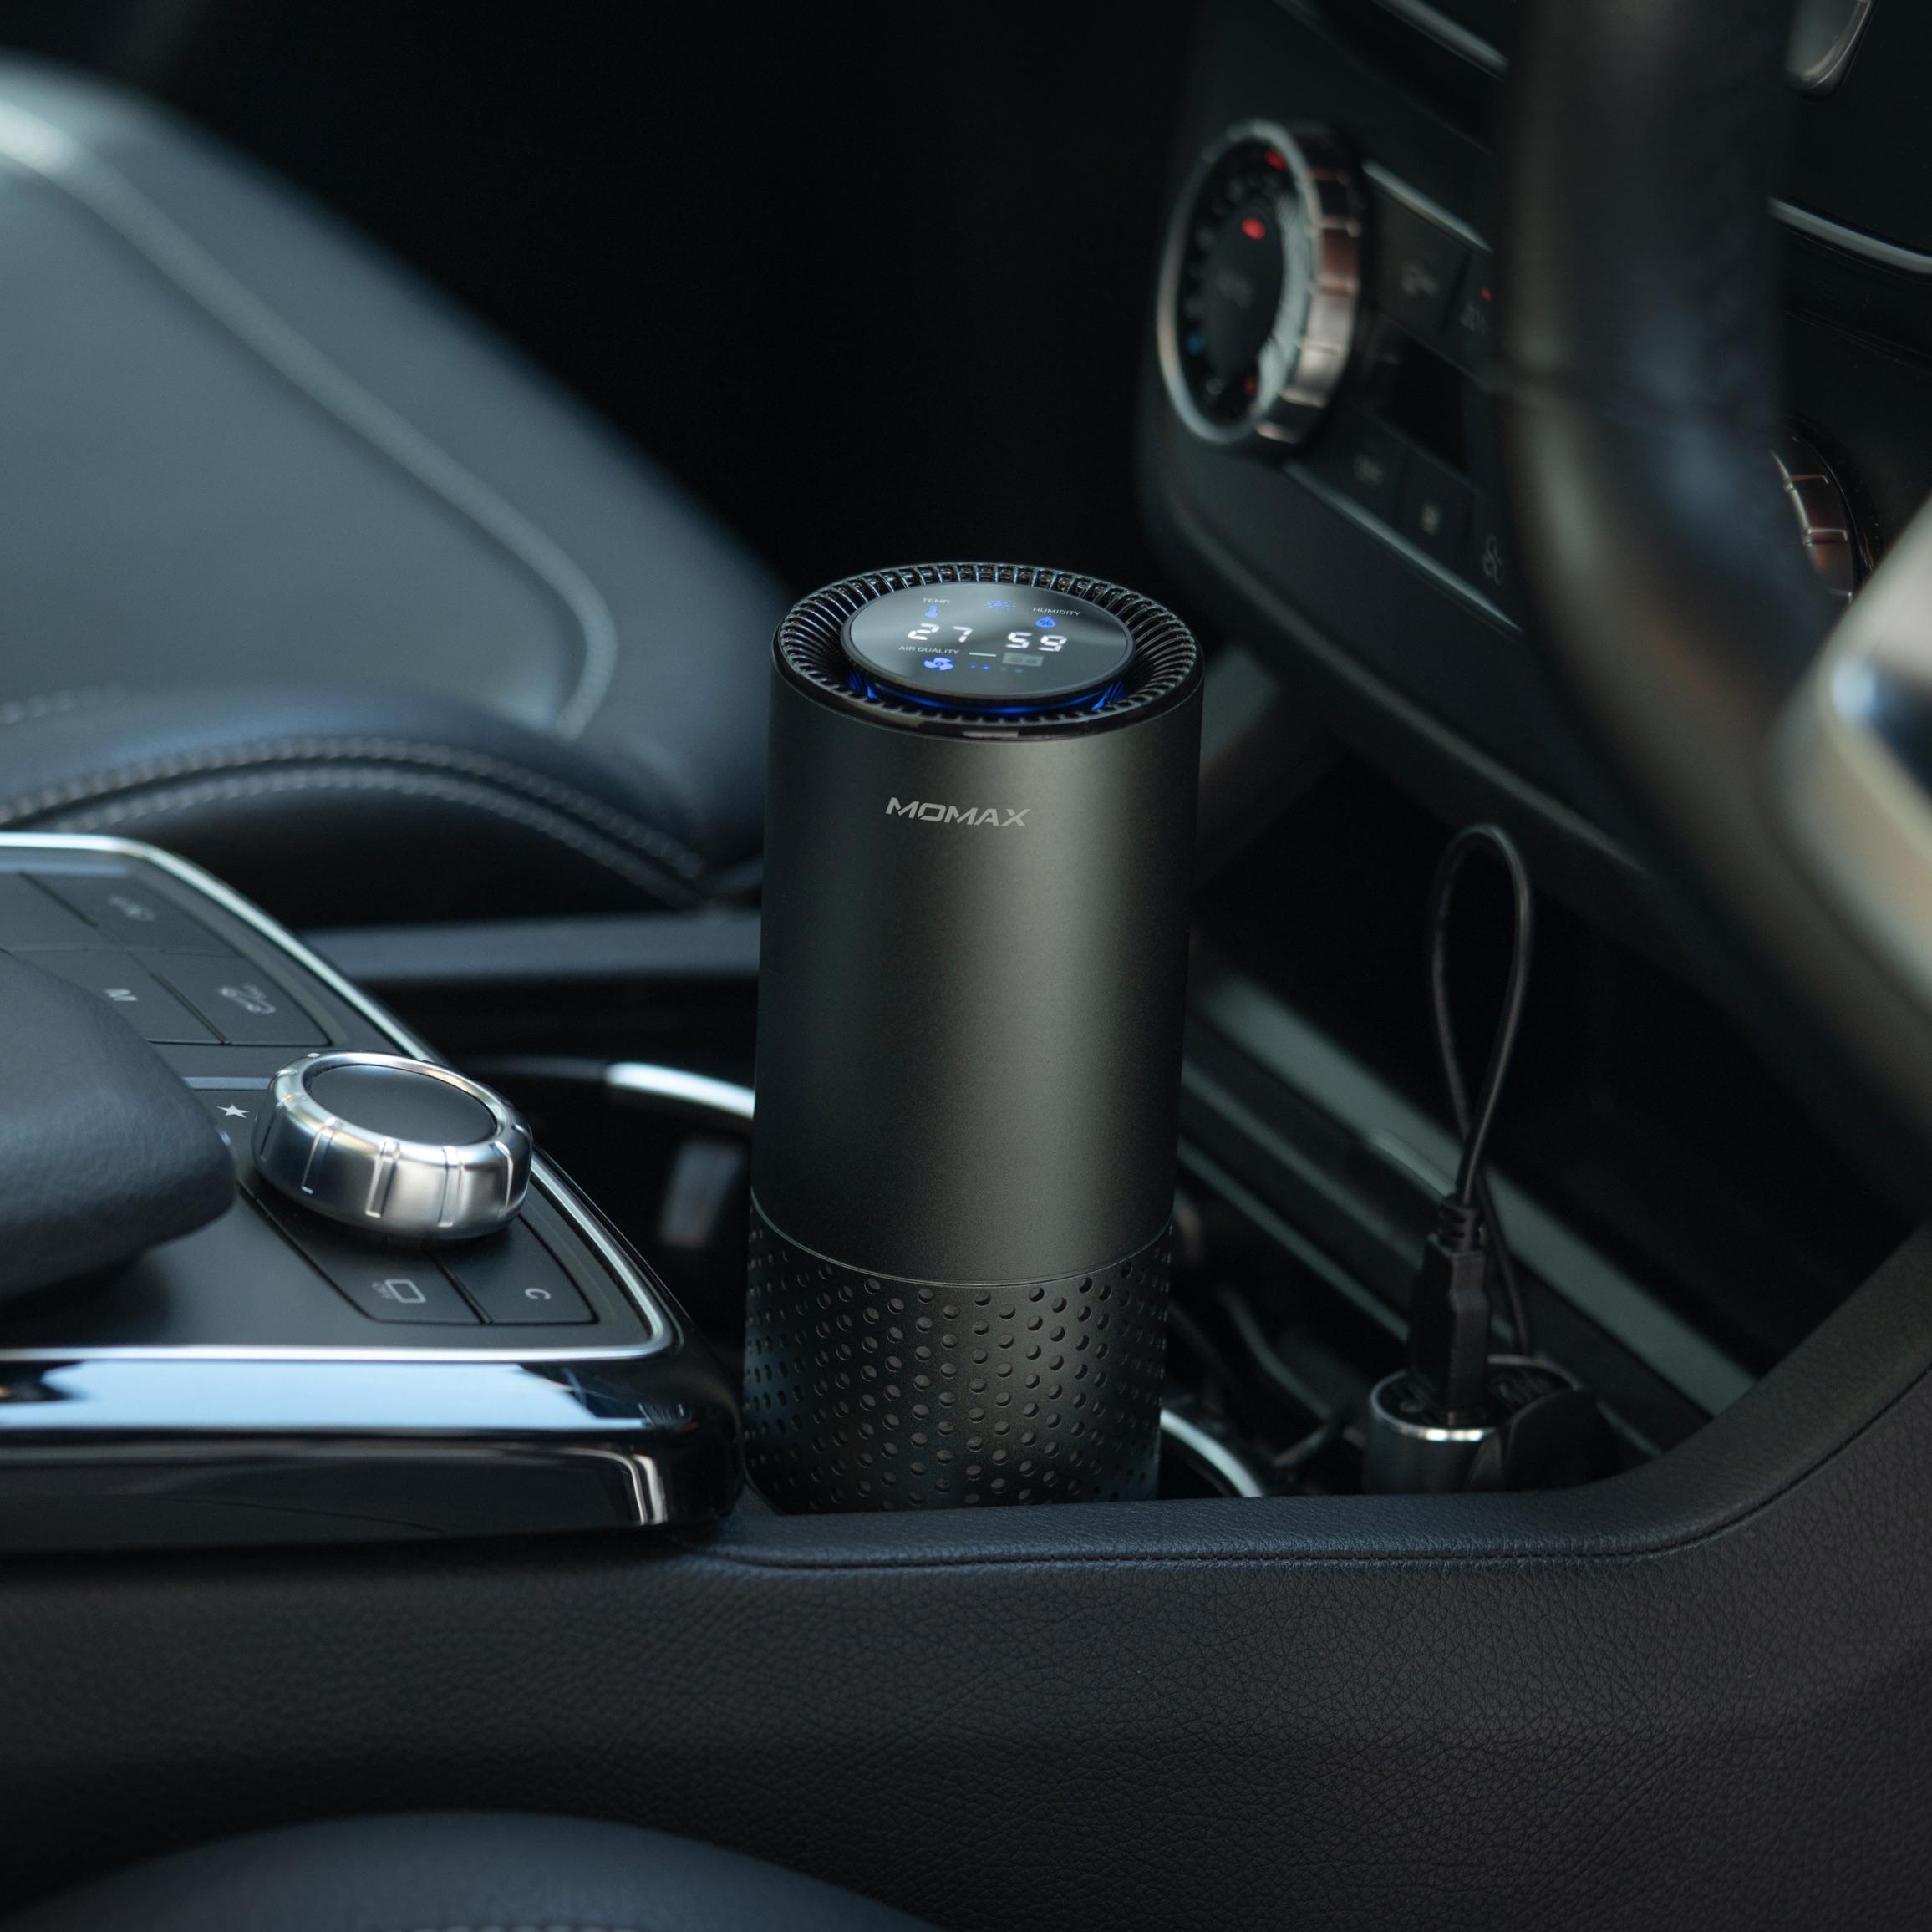 Momax AP5 Pure Go 智能便攜空氣清新機